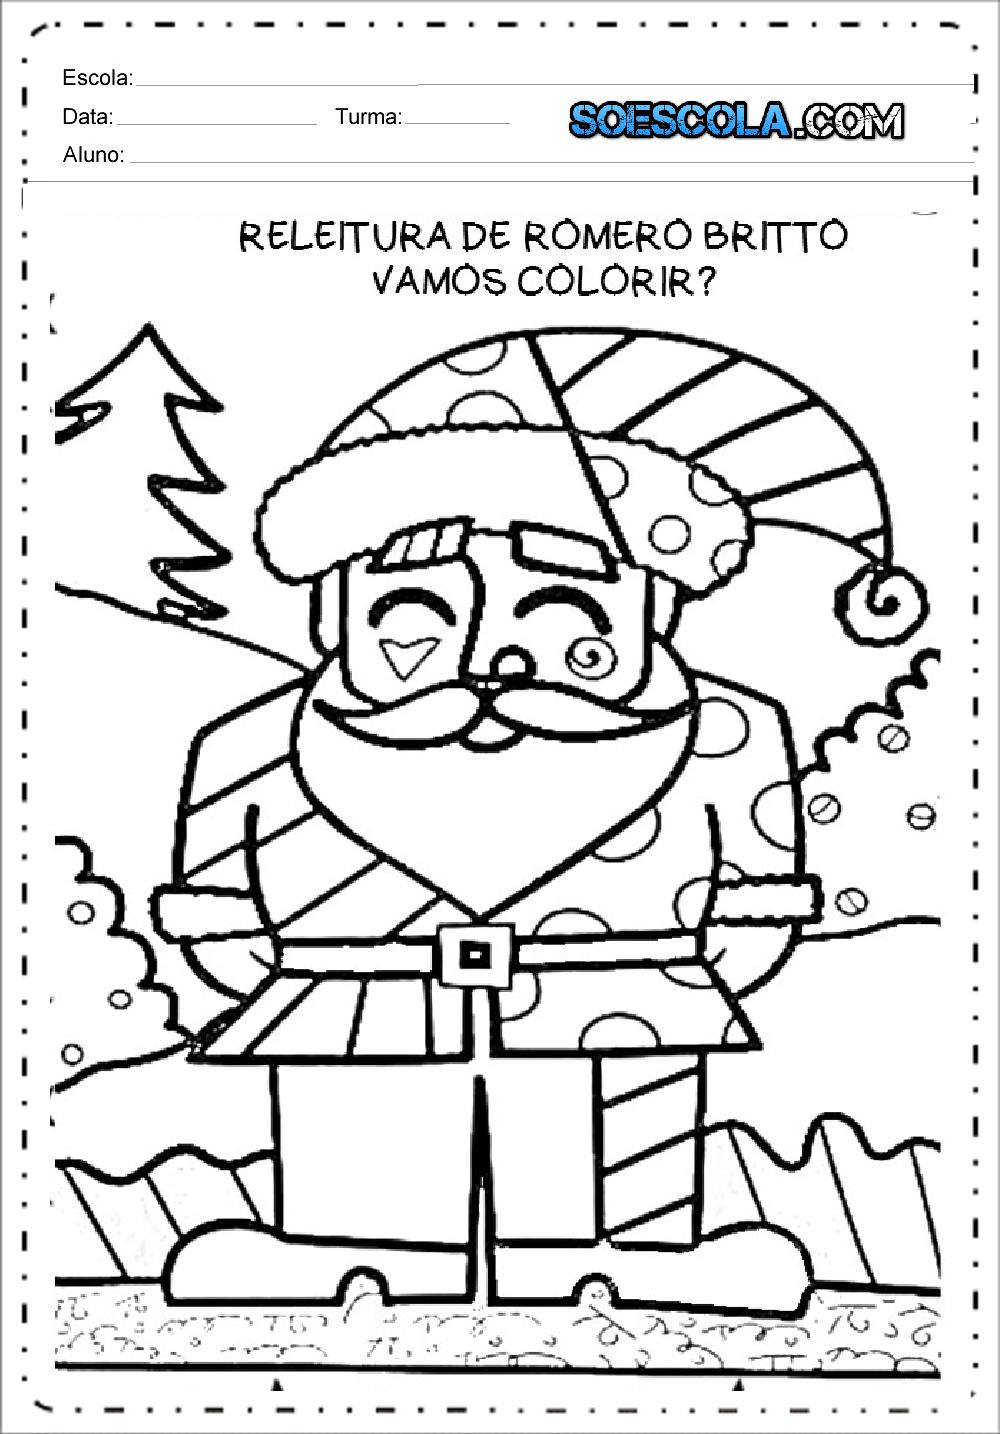 Papai Noel Releitura Romero Britto Desenhos Do Natal Para